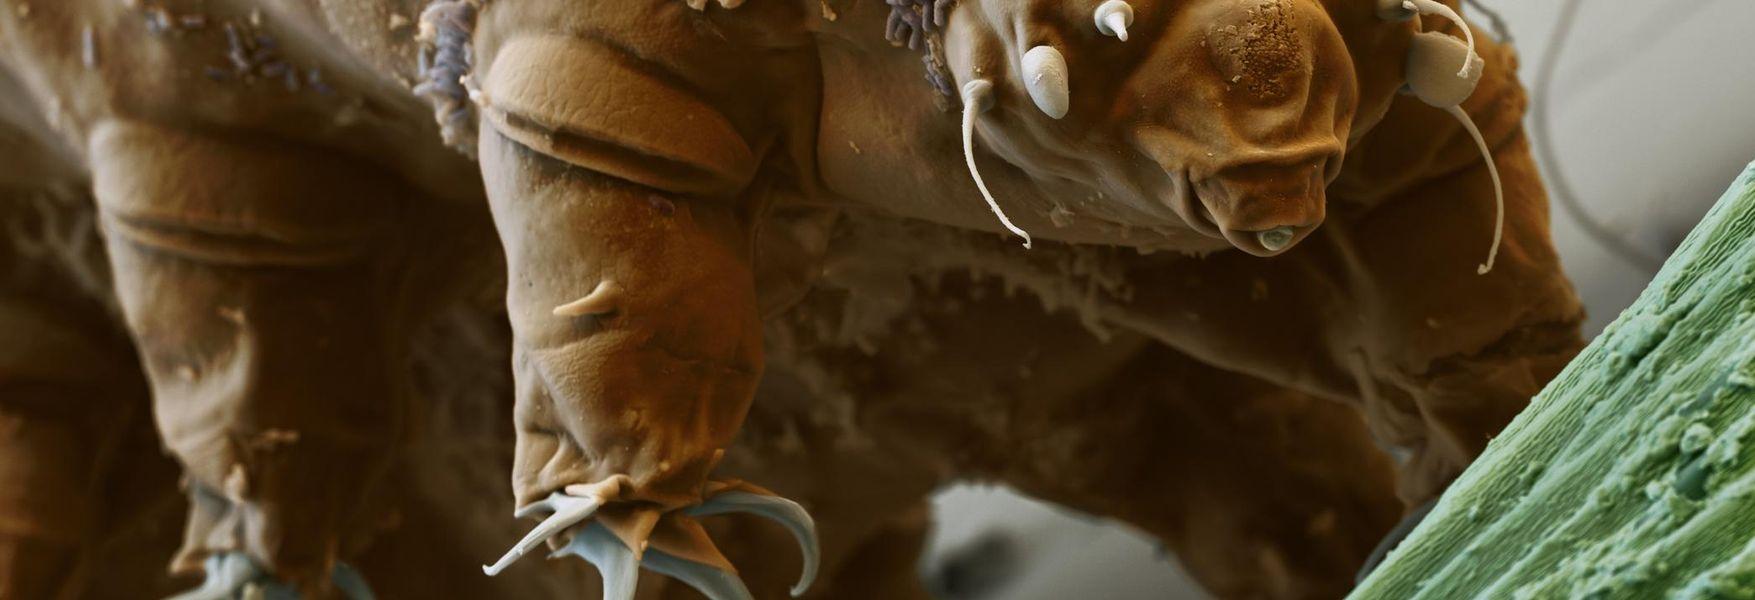 Tardígrados, animales con superpoderes - OpenMind